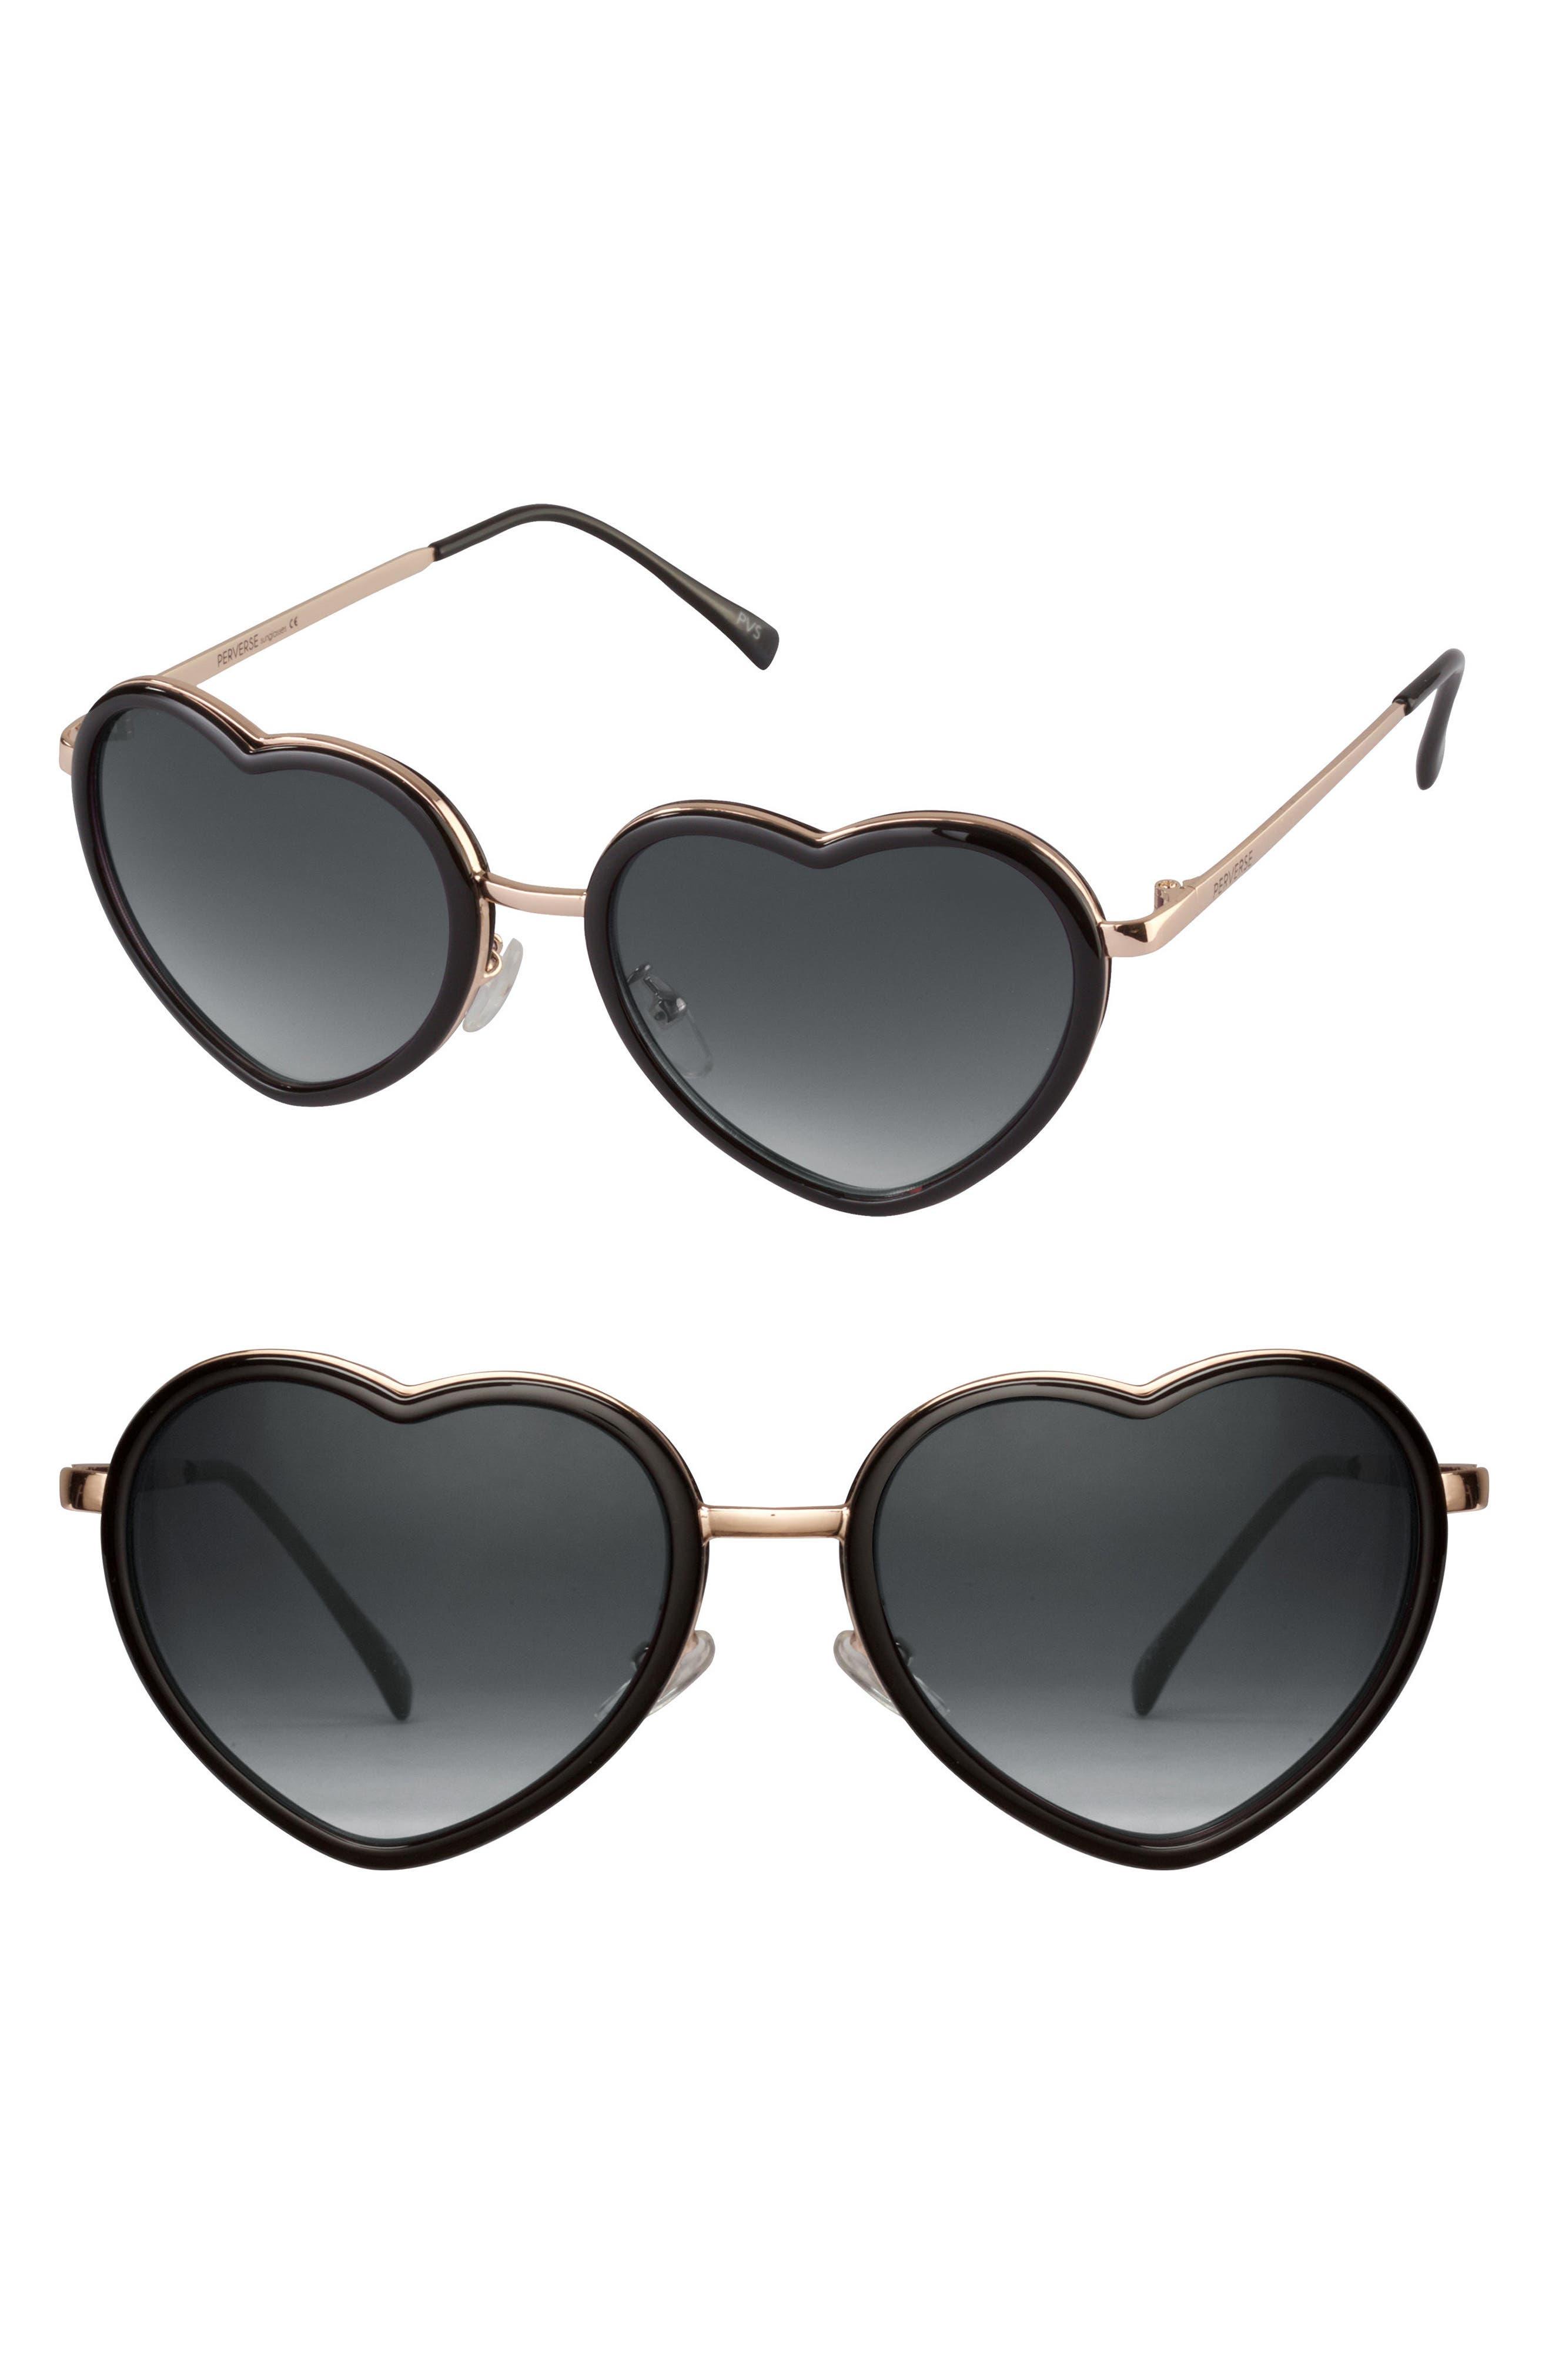 Poipu 52mm Heart Sunglasses,                         Main,                         color,